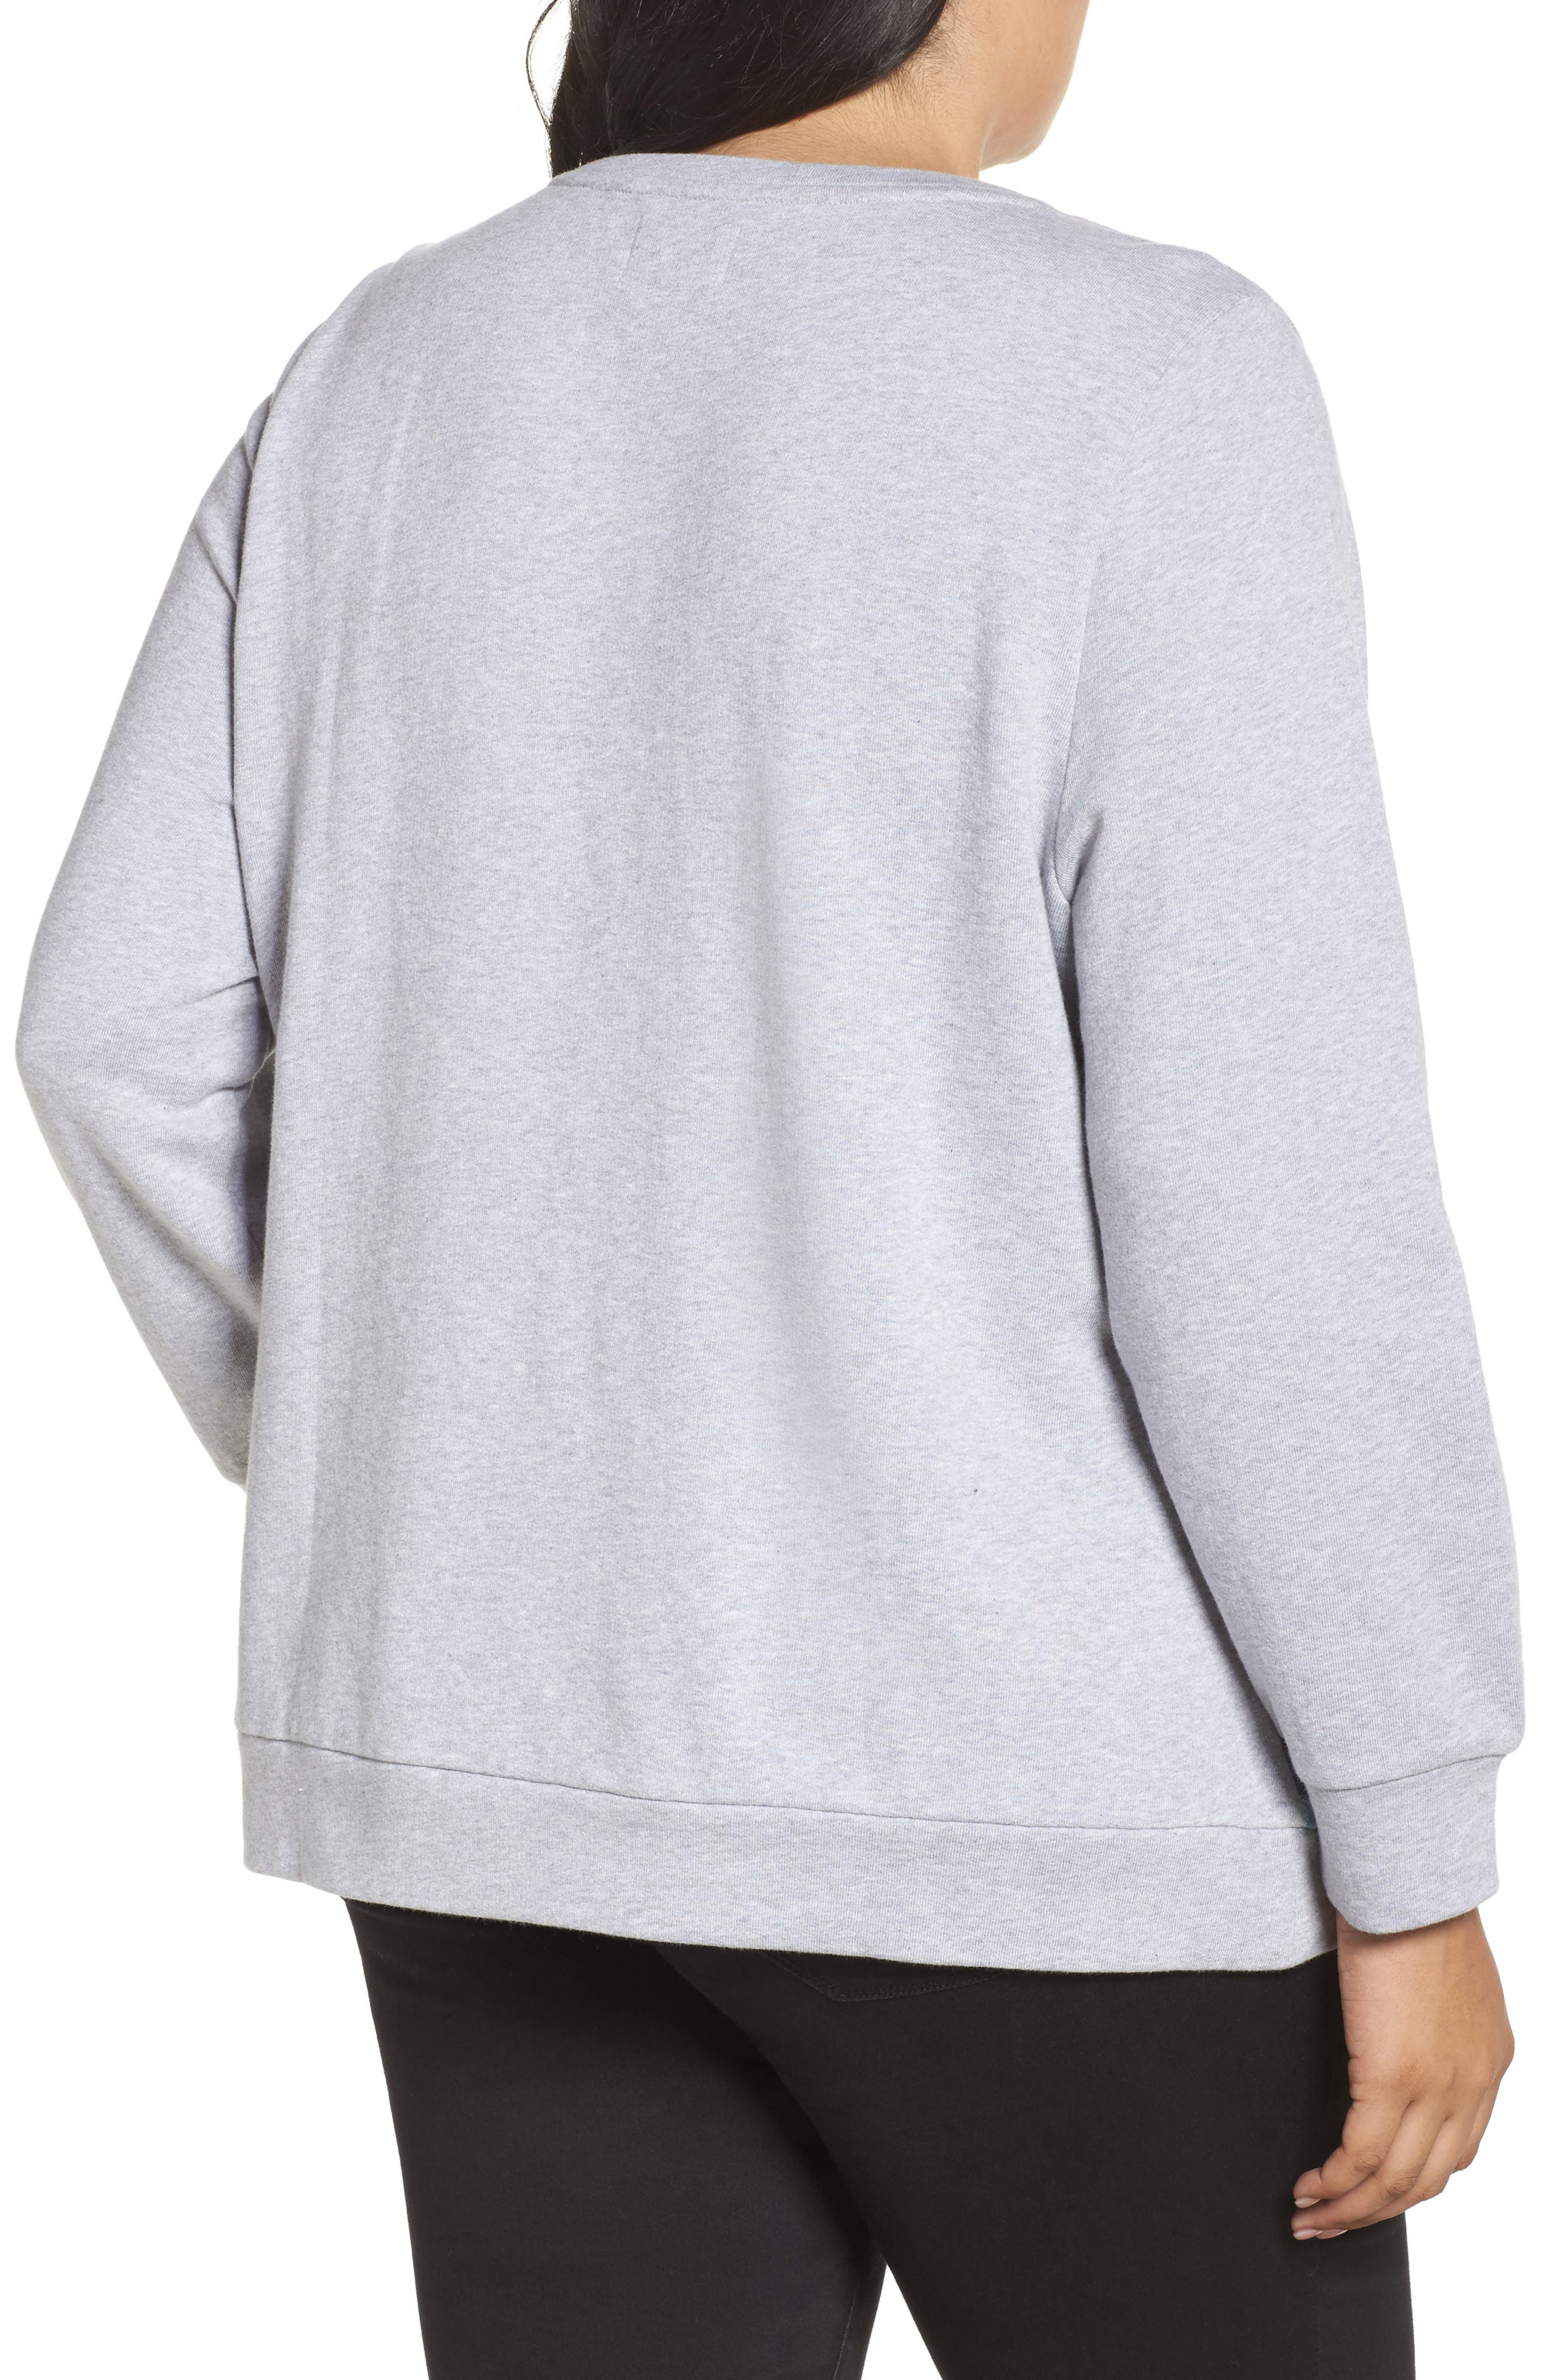 Patchwork Sweatshirt,                             Alternate thumbnail 2, color,                             Grey Floral